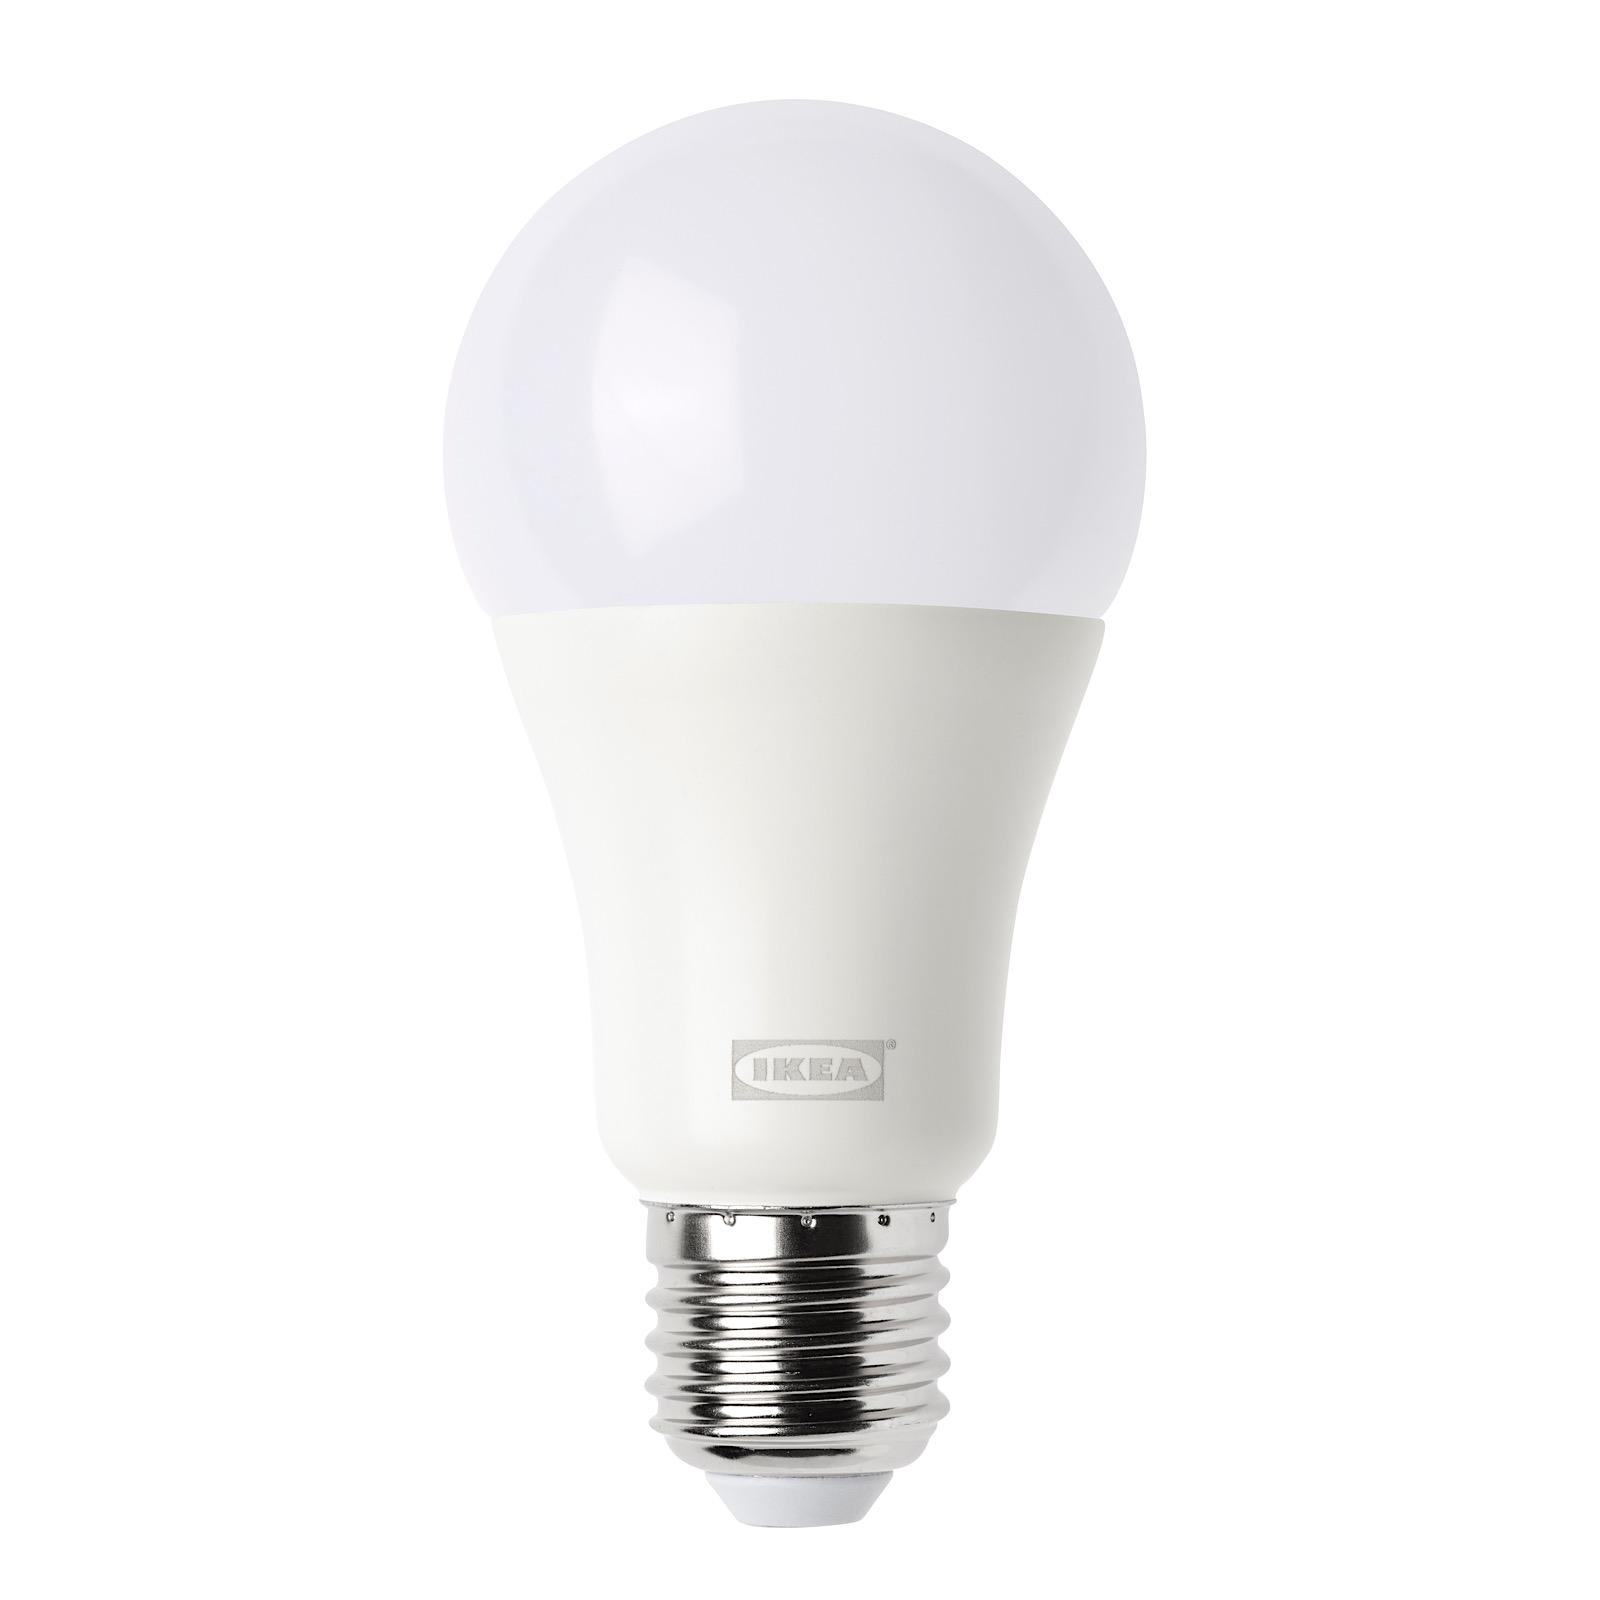 ikeas smart lighting revolution begins slowly pickr